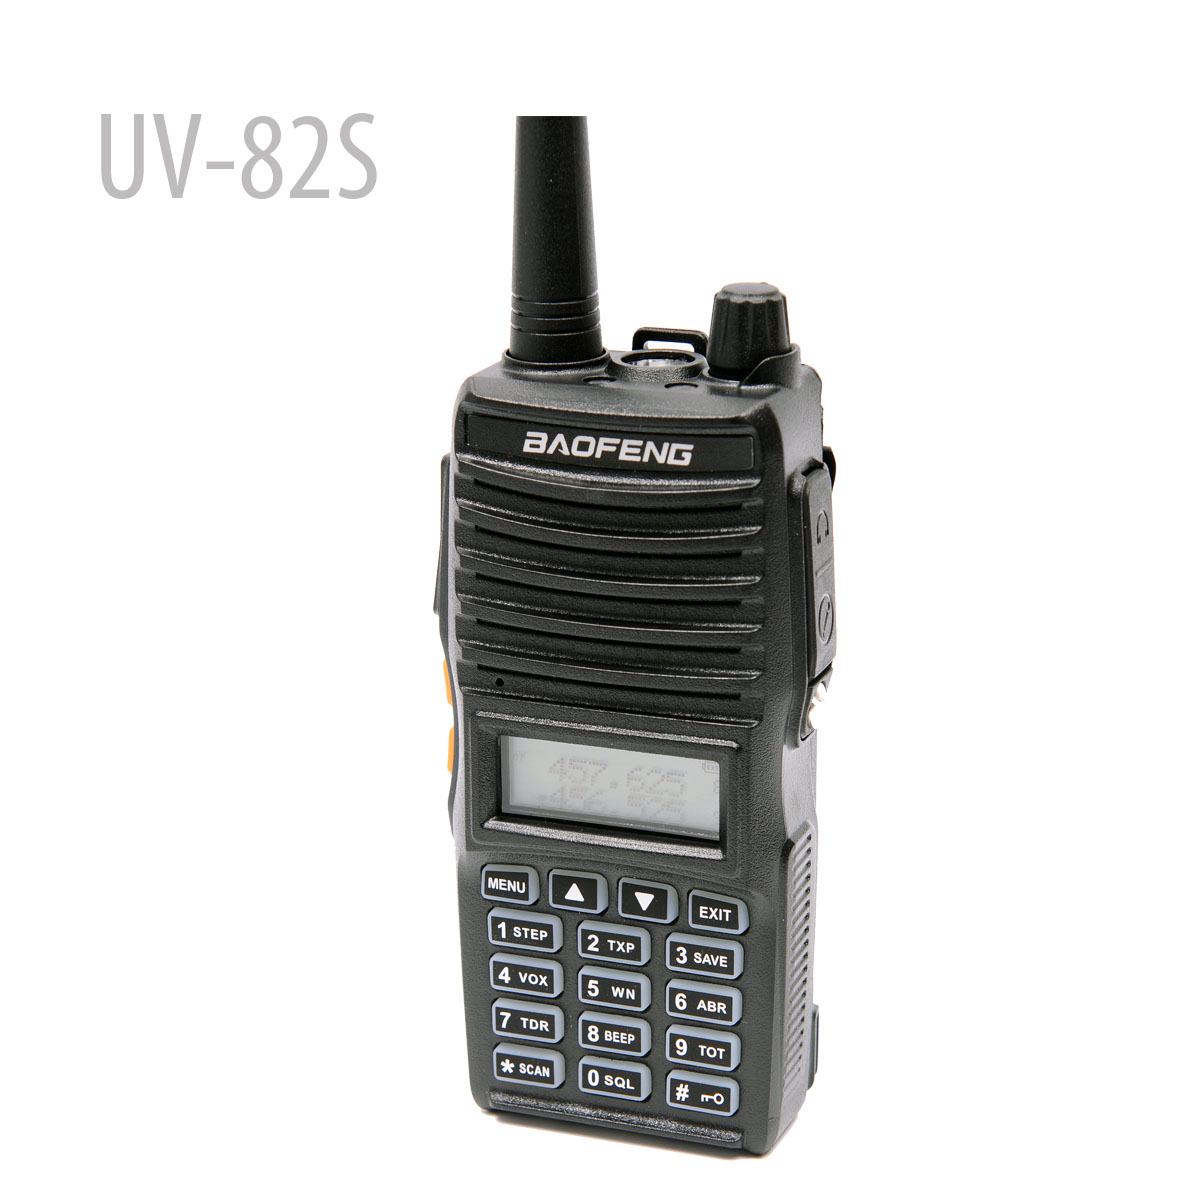 New Arrival Baofeng UV-82S 5W 136-174MHz & 400-520MHz Dual Band Handheld Walkie Baofeng UV-82 H/L Power HIGH (5W VHF /UHF 4W)/ LOW 1W Walkie Talkie Transceiver Dual Band 136-174/400-520MHz True 5W High Power Two-WayRadios